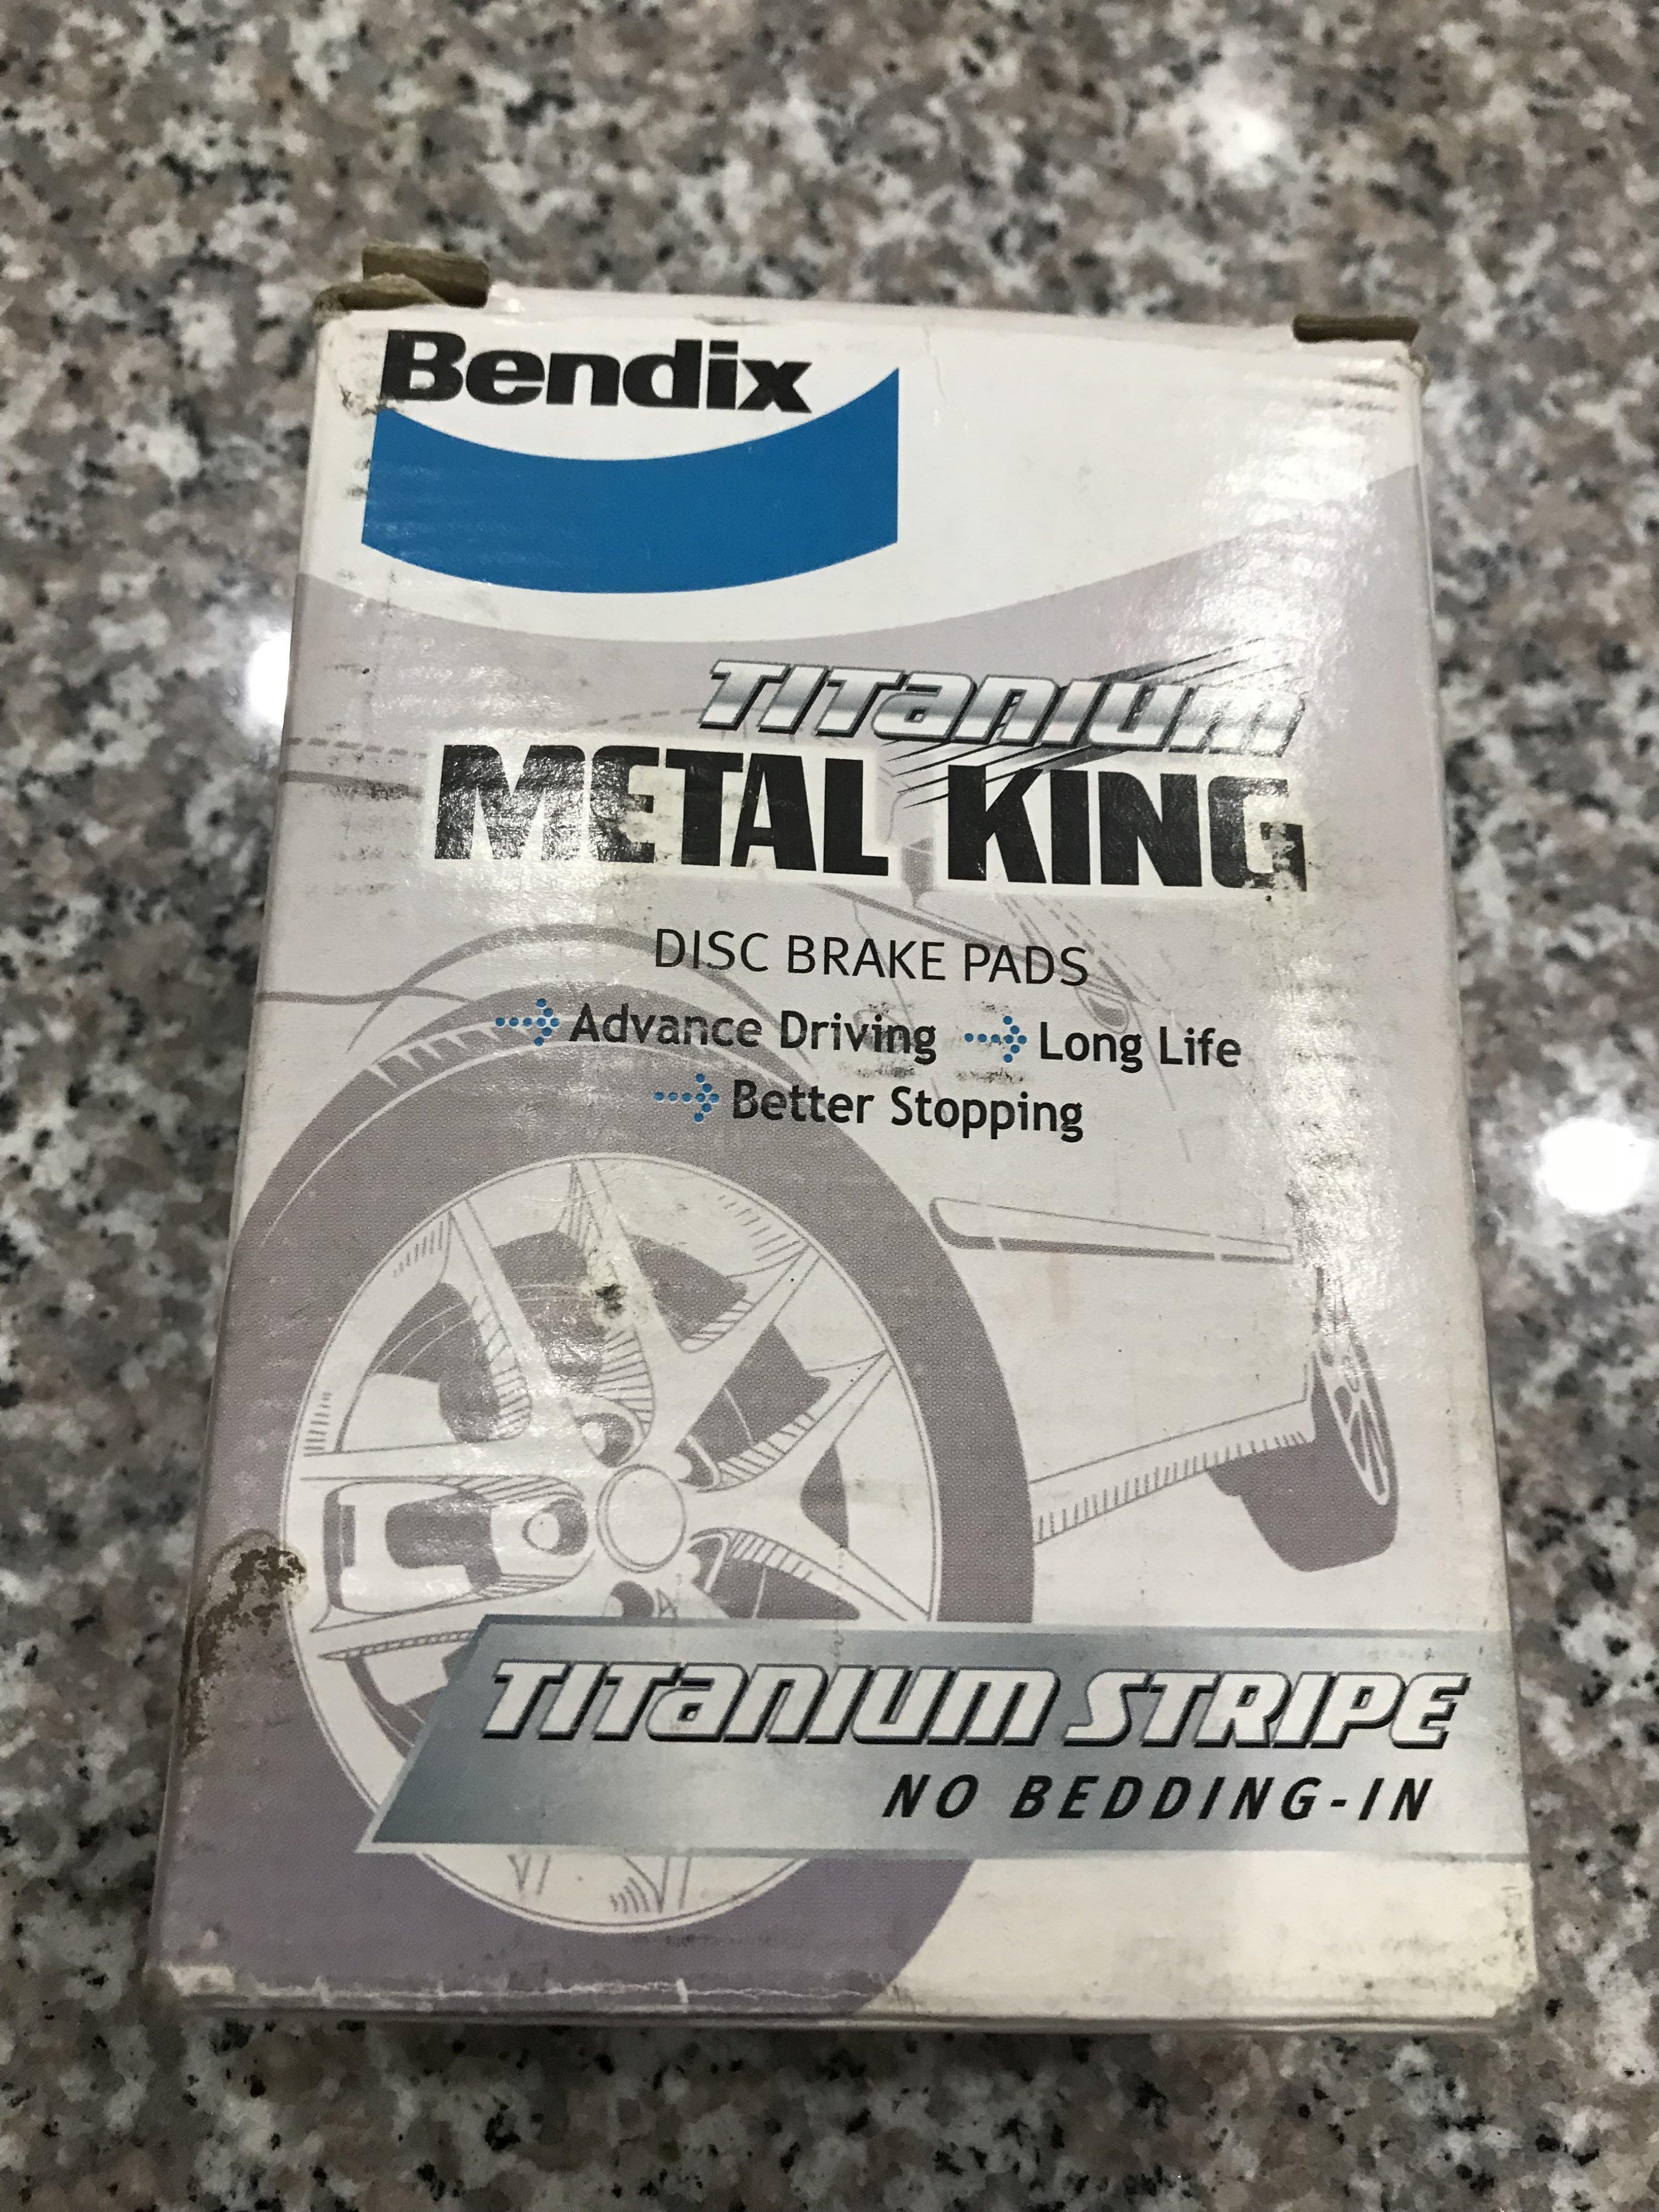 Bendix 煞車來令片(FORD FOCUS 1.8/2.0,Mazda3.5)